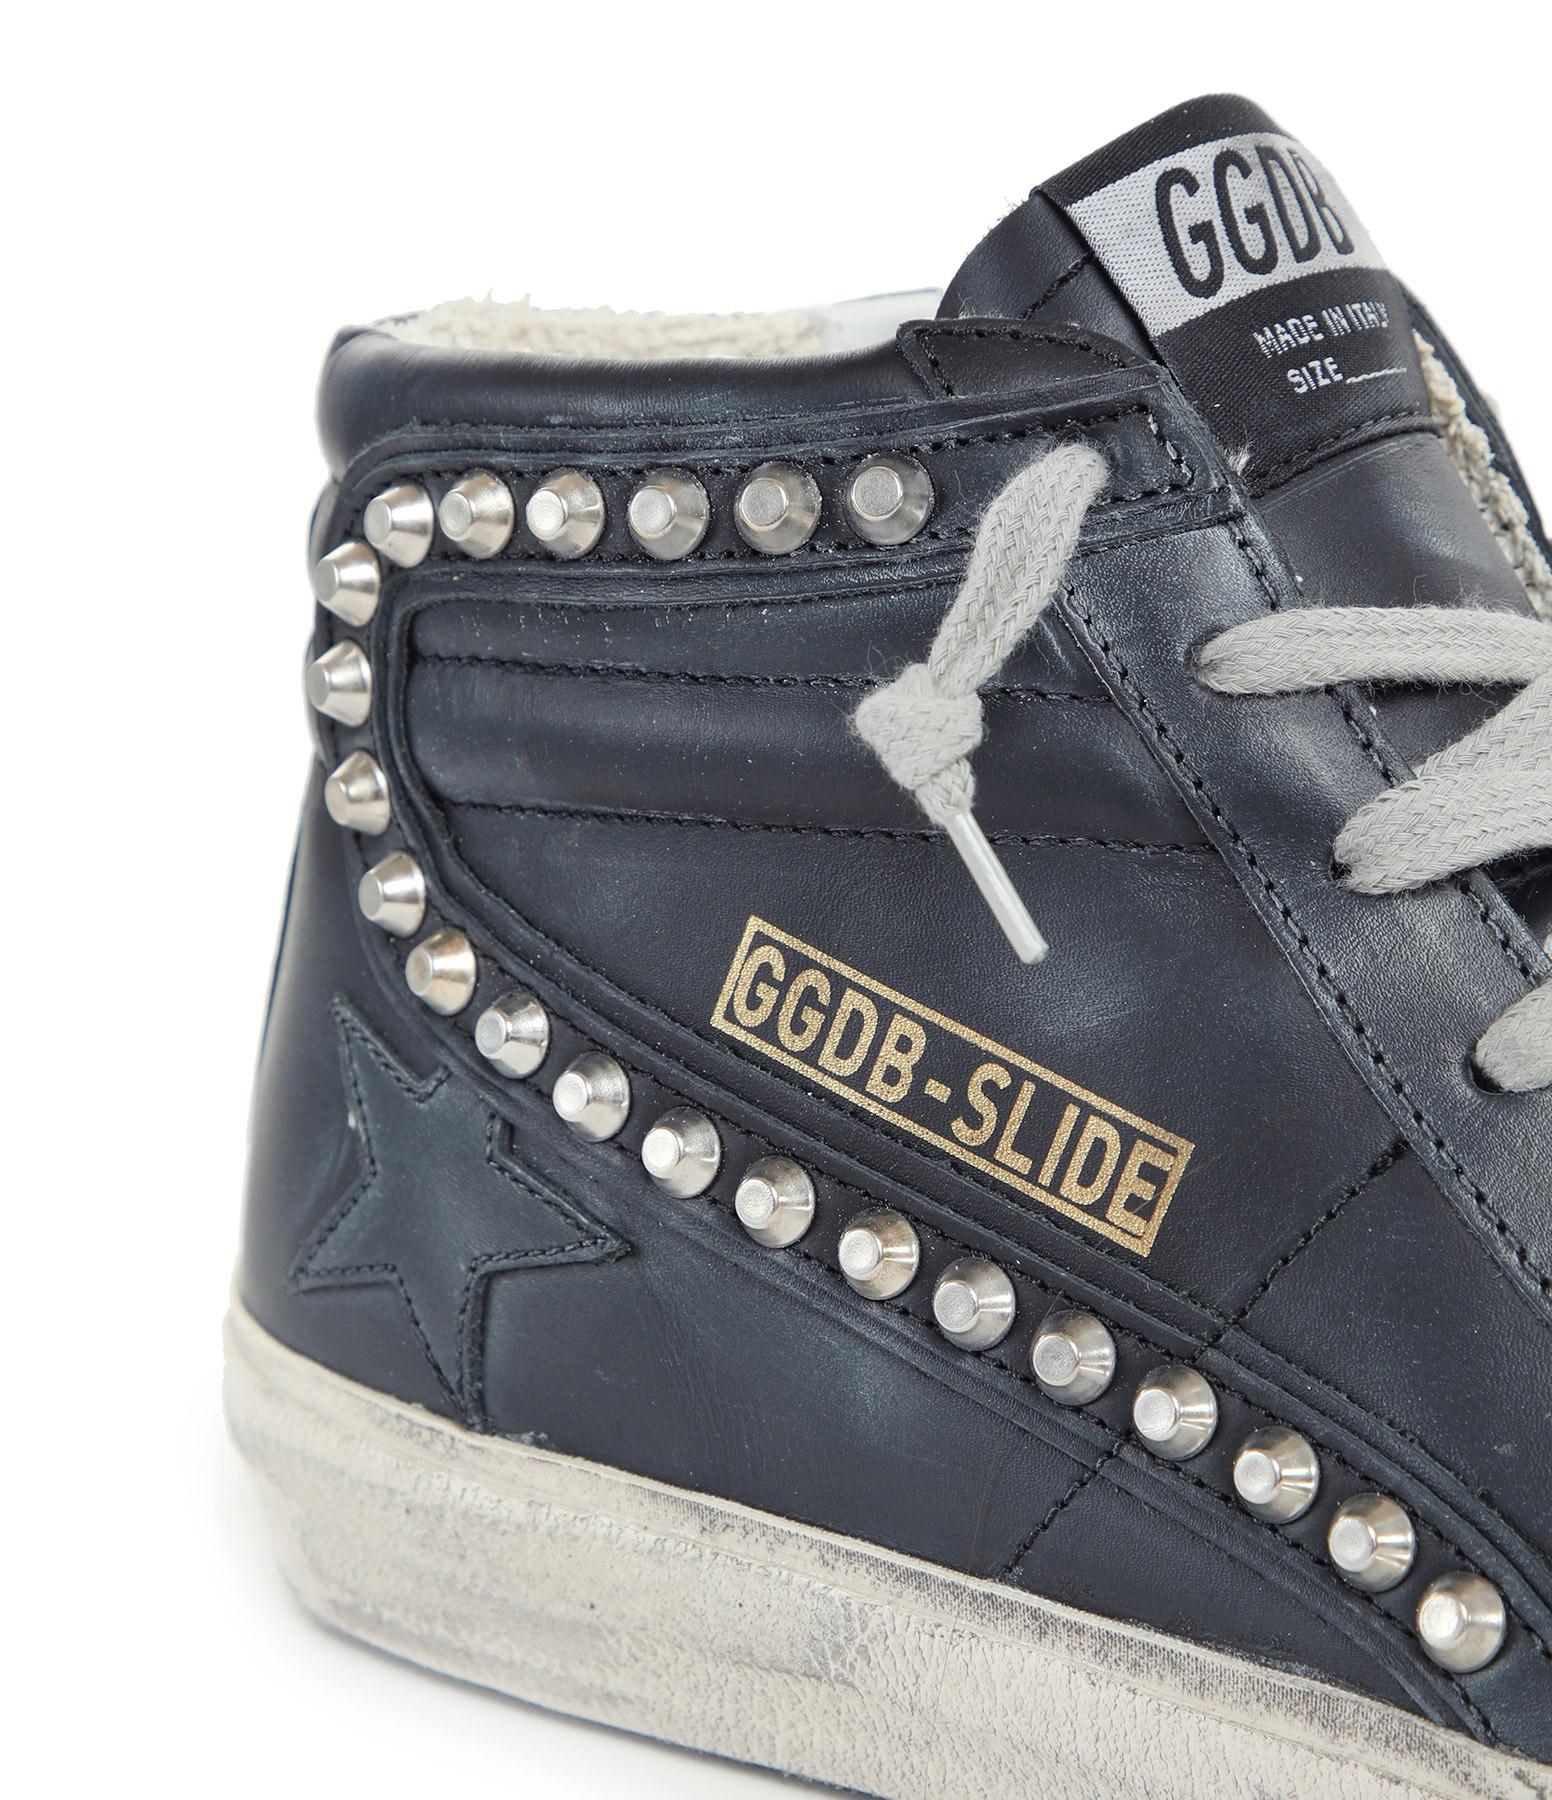 GOLDEN GOOSE - Baskets Slide Cuir Clous Noir